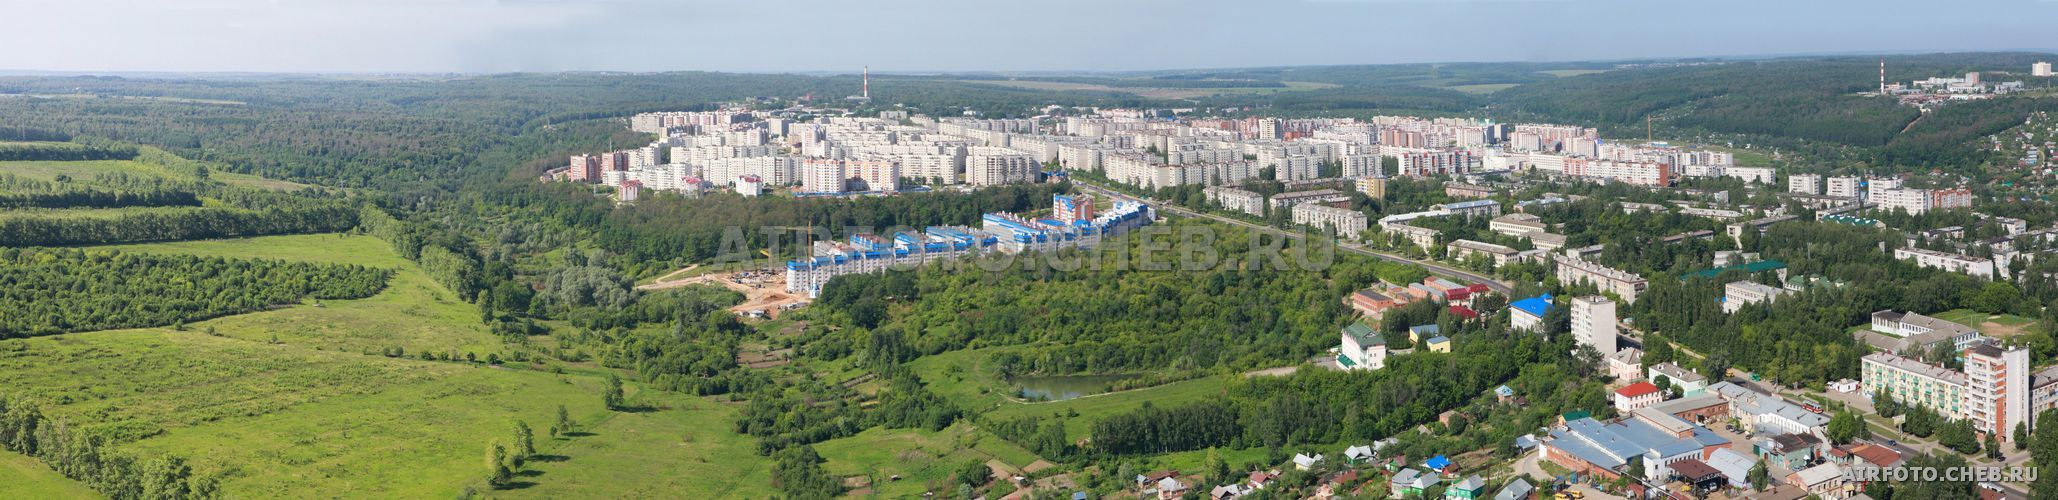 Чебоксары (май 2010)